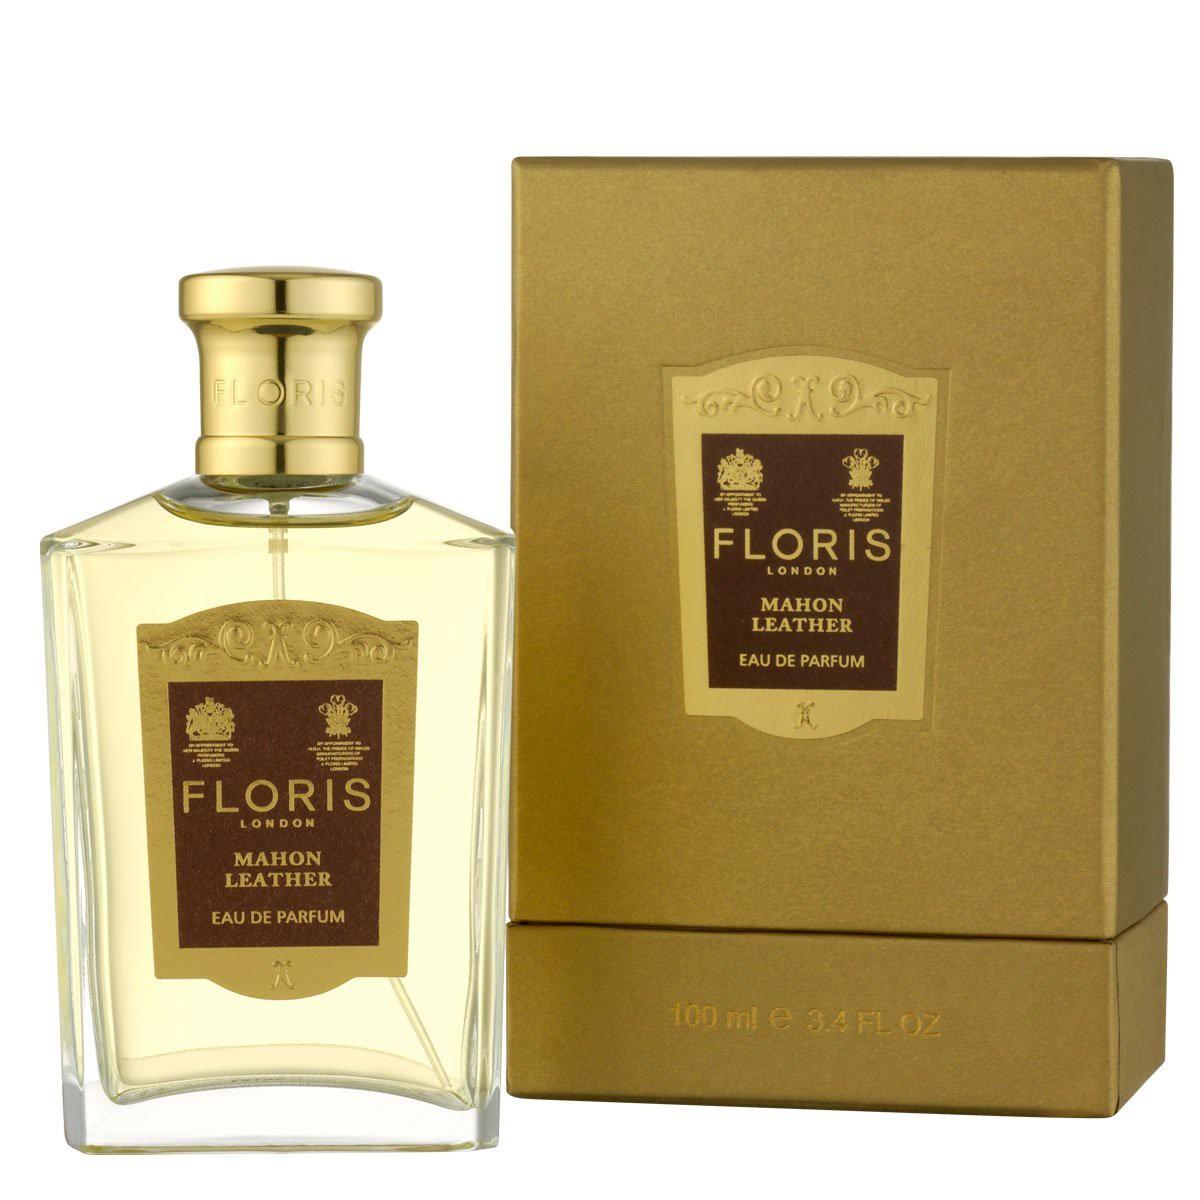 Floris Mahon Leather аромат для мужчин